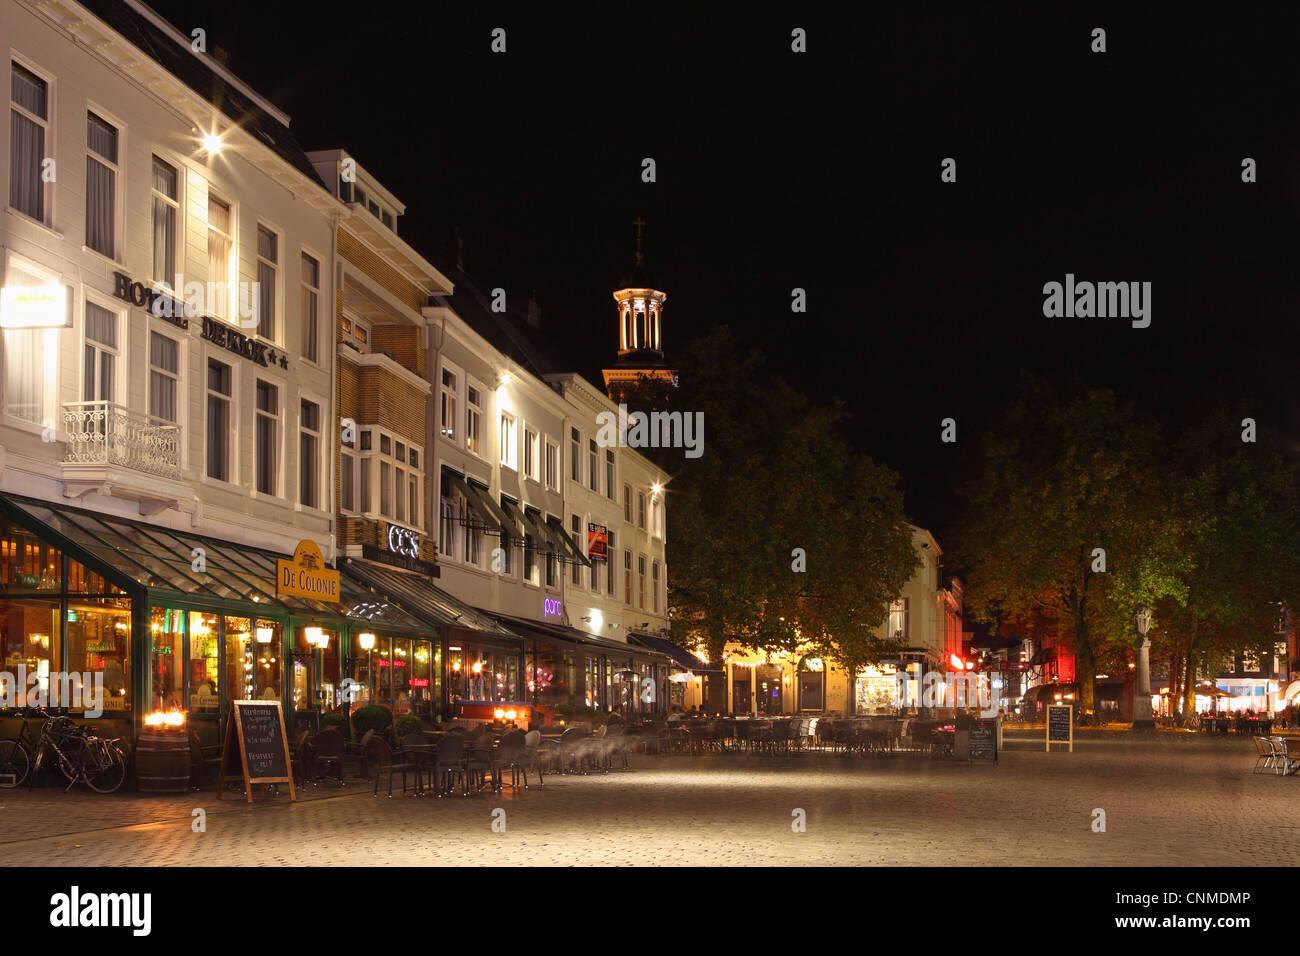 Breda Netherlands Stockfotos & Breda Netherlands Bilder Alamy